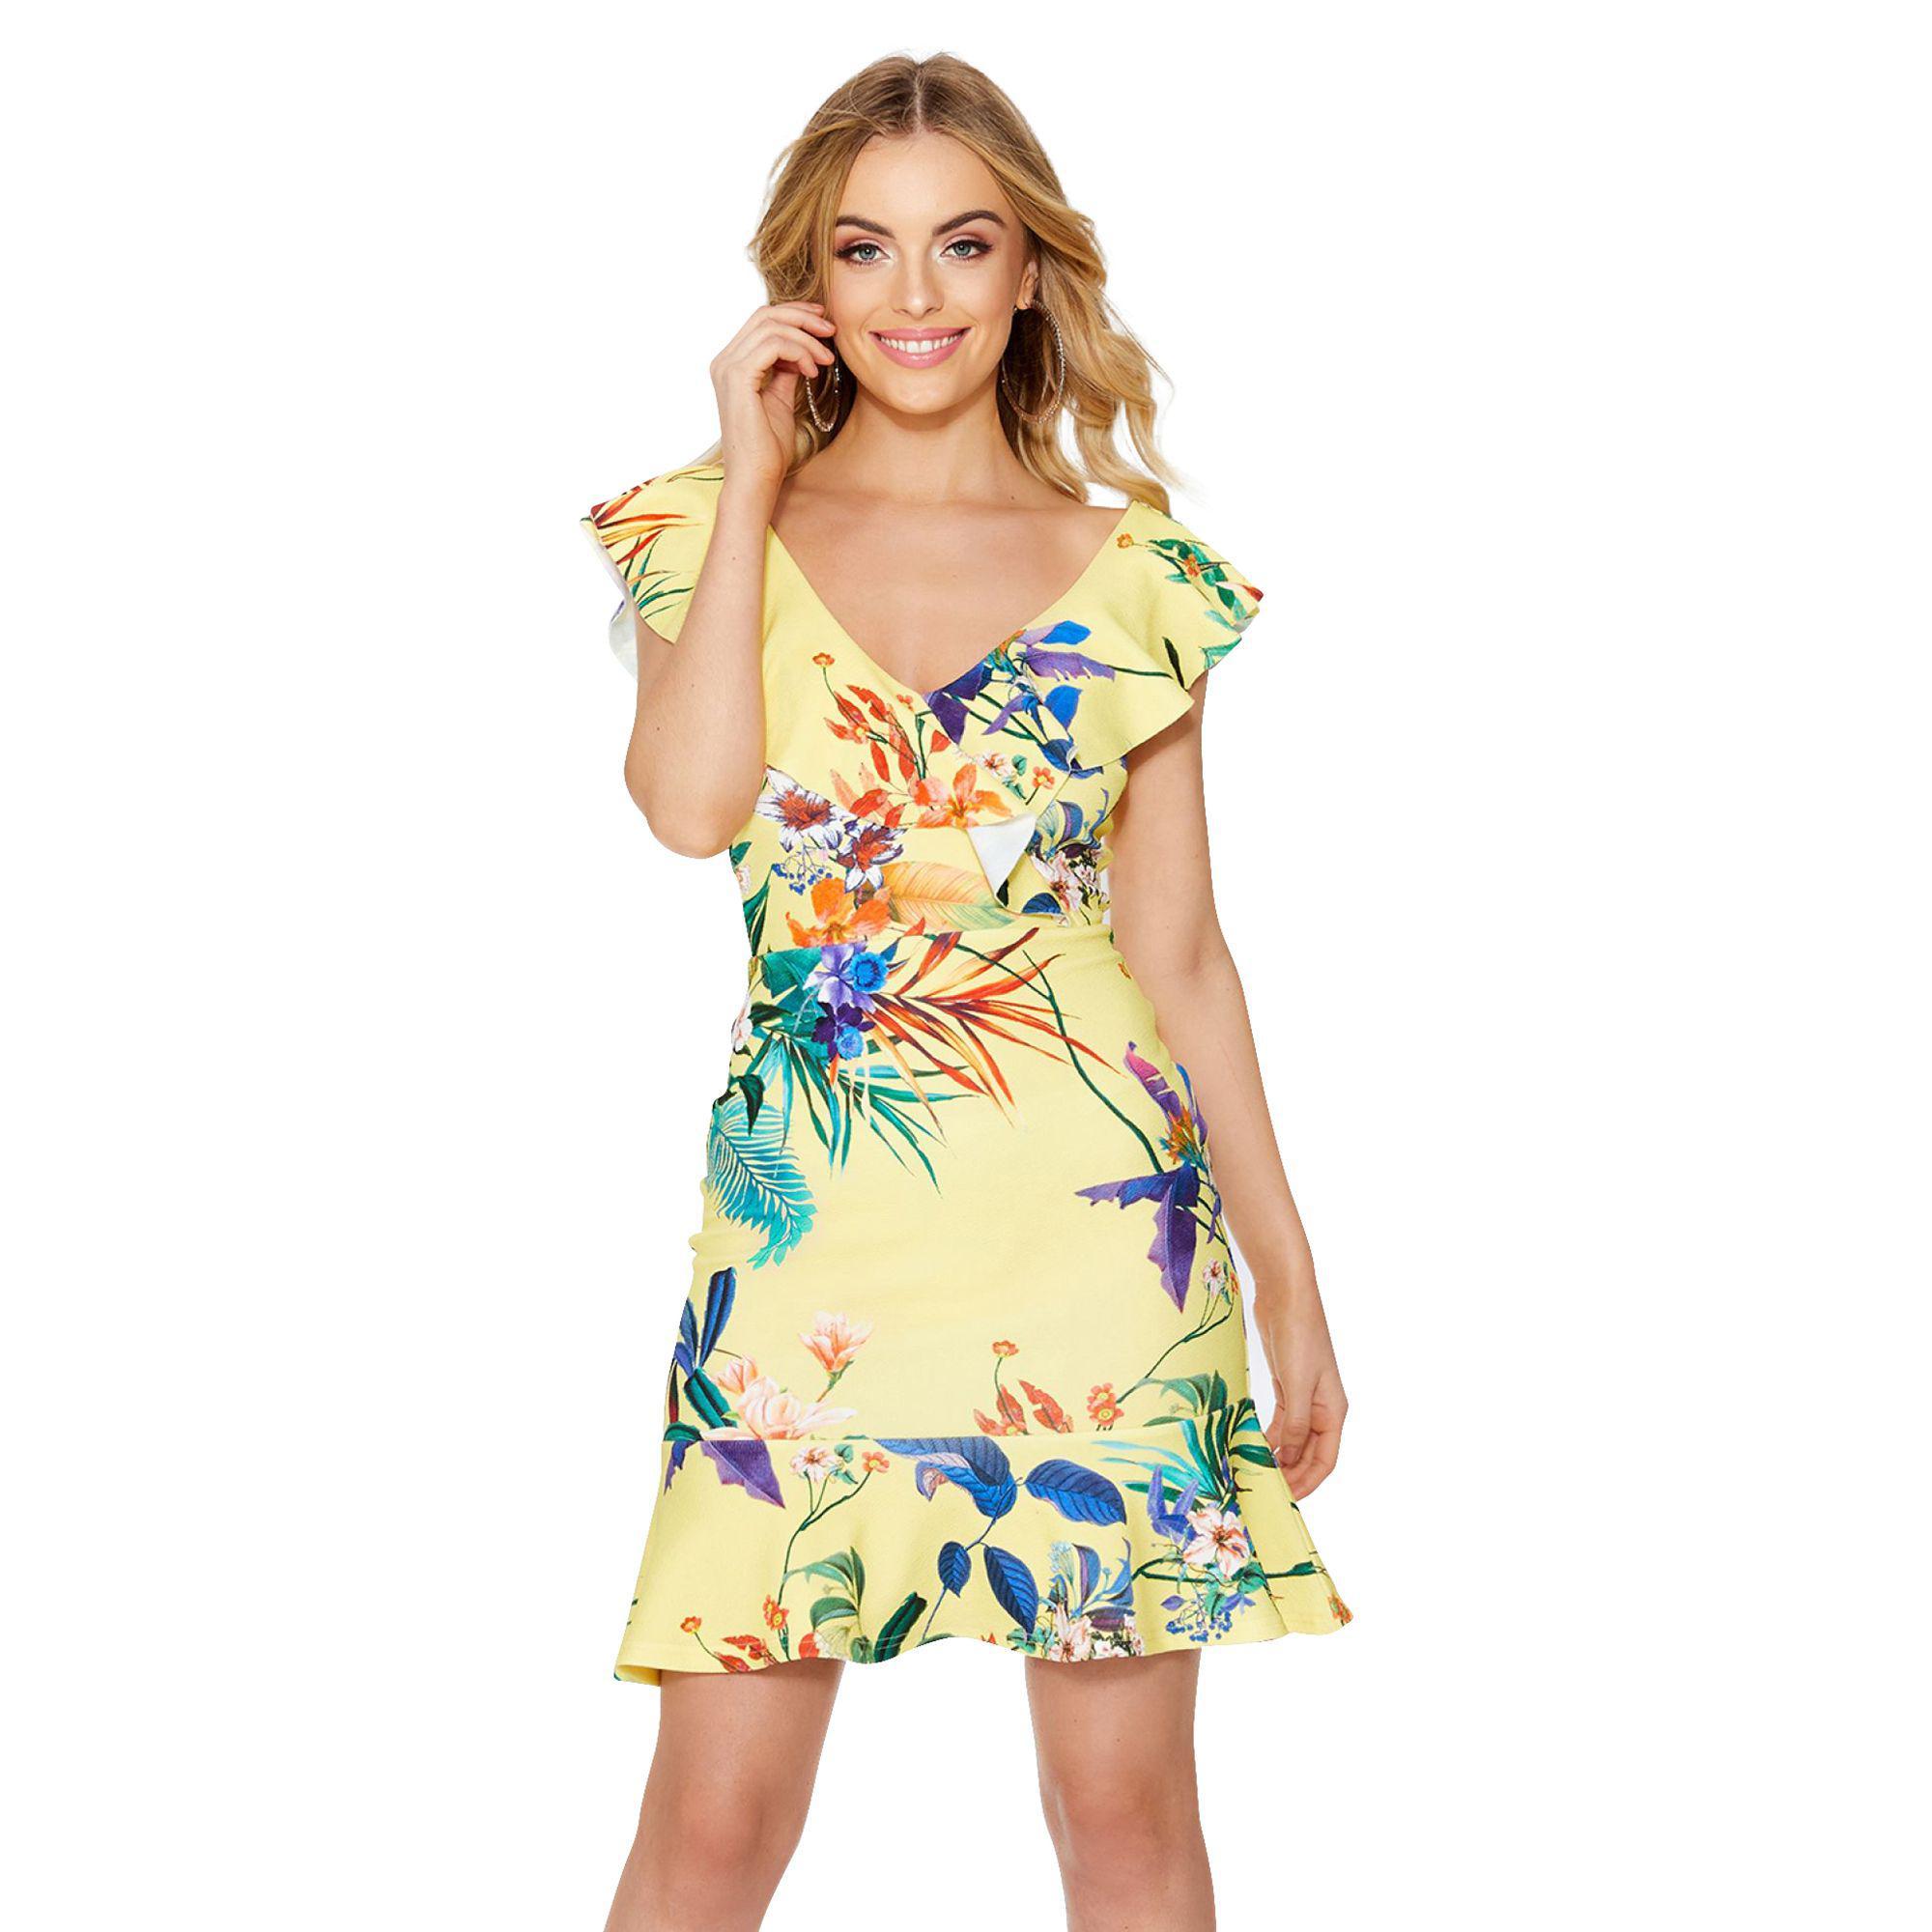 b591e0a2843e Quiz - Yellow Floral Print Frill Dress - Lyst. View fullscreen